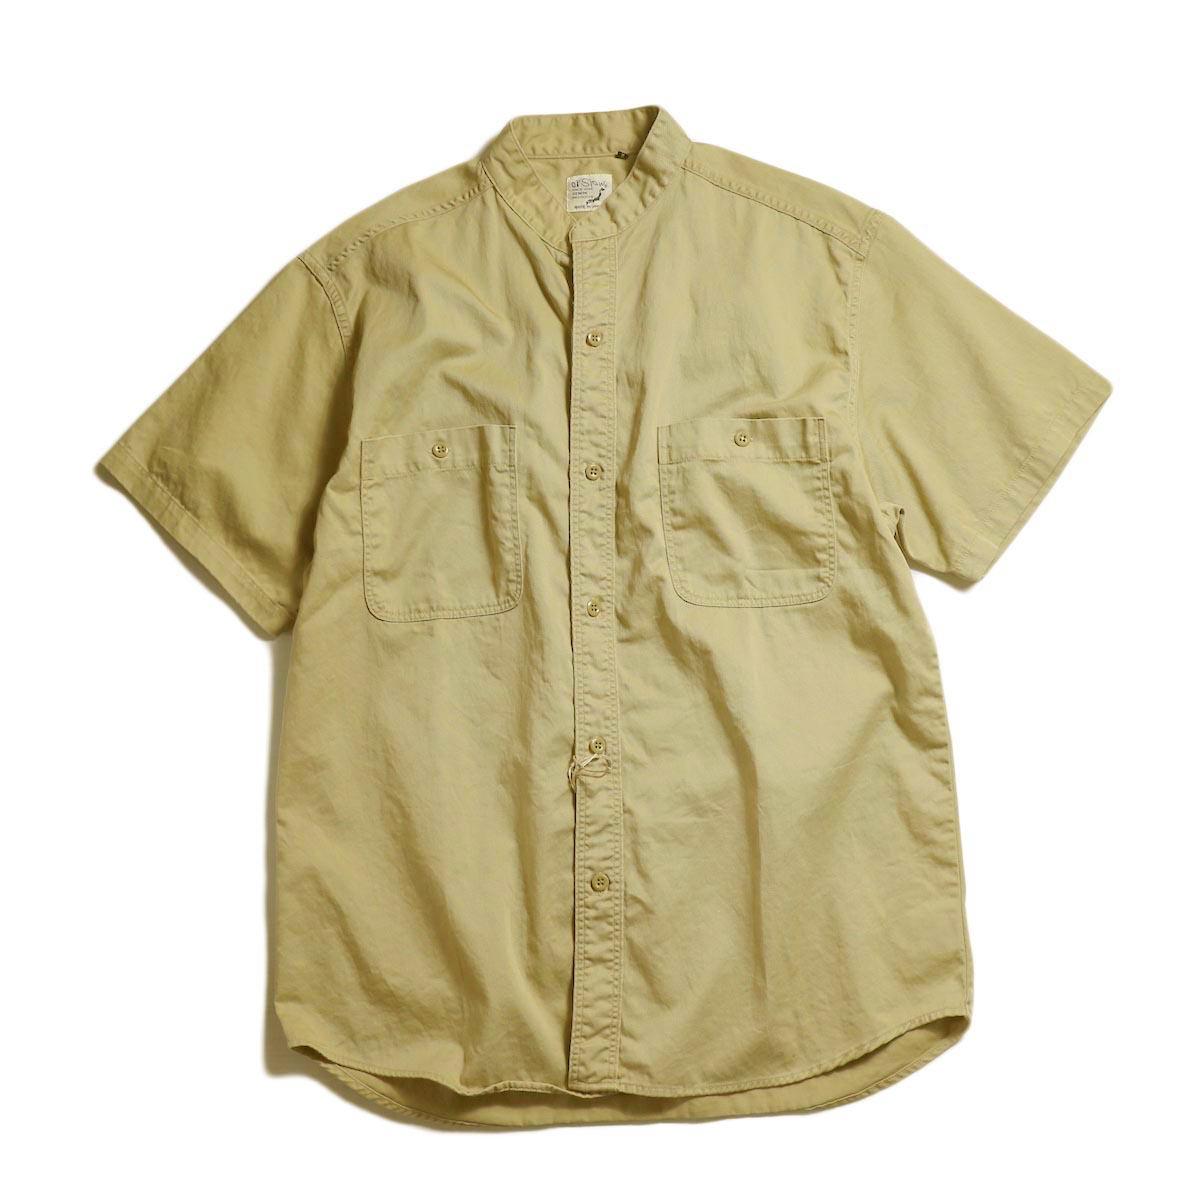 orSlow / STAND COLLAR SHORT SLEEVE SHIRT -Khaki